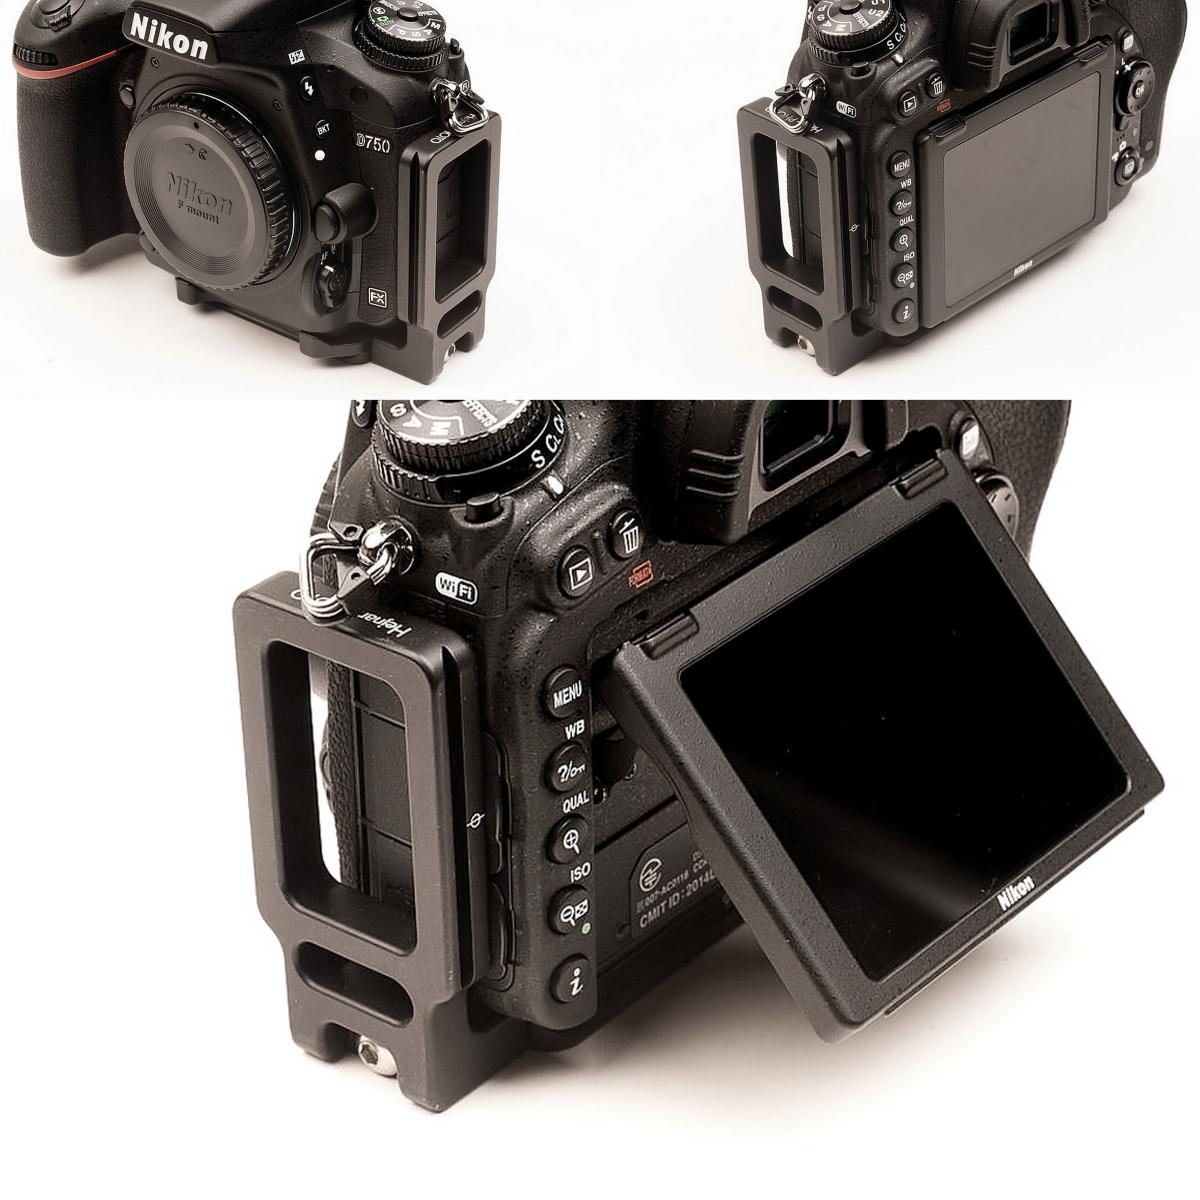 Hejnar PHOTO ND750 L bracket on Nikon D750 front - side - rear views